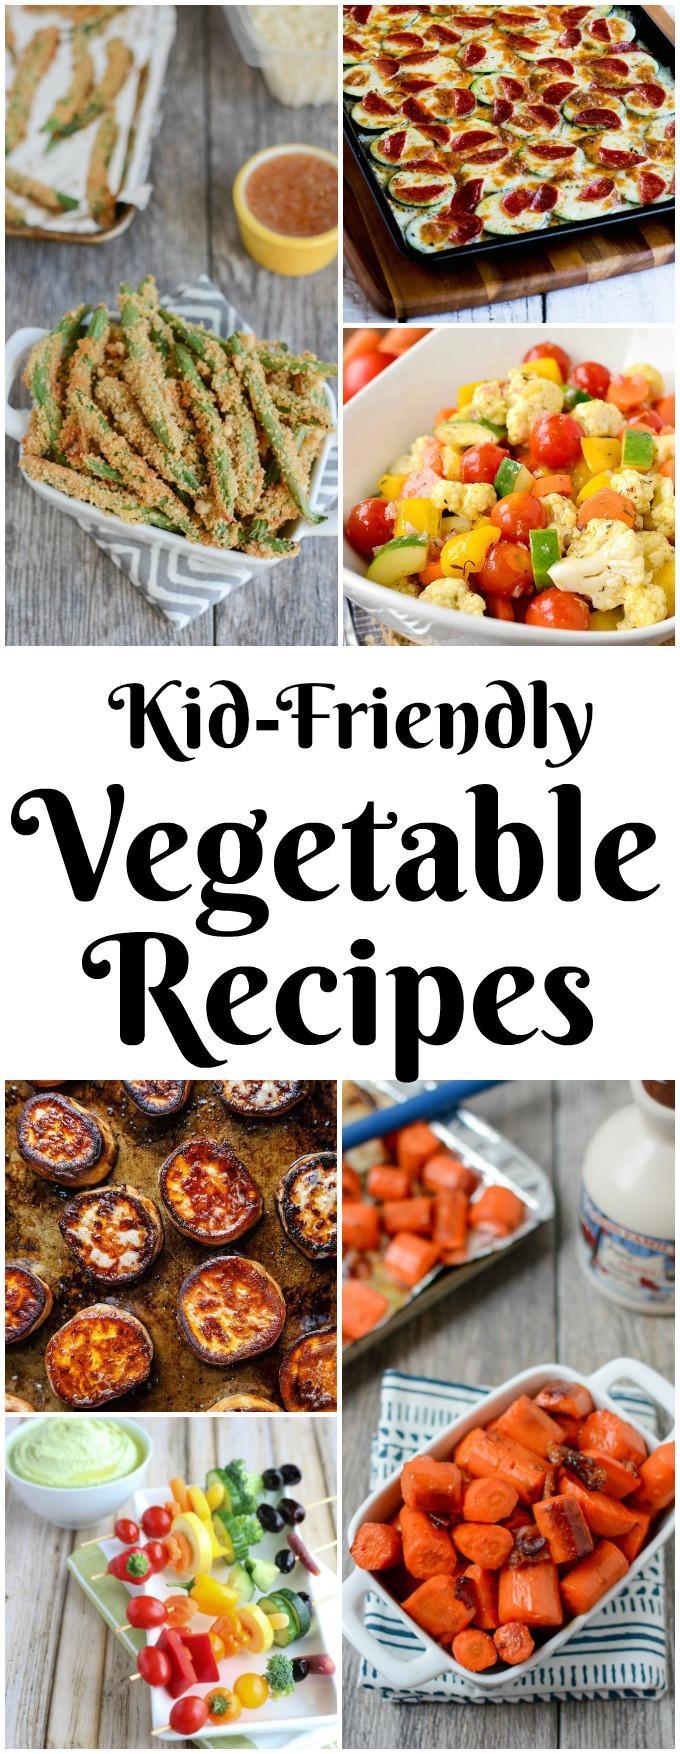 Easy Healthy Kid Friendly Recipes  10 Kid Friendly Ve able Recipes